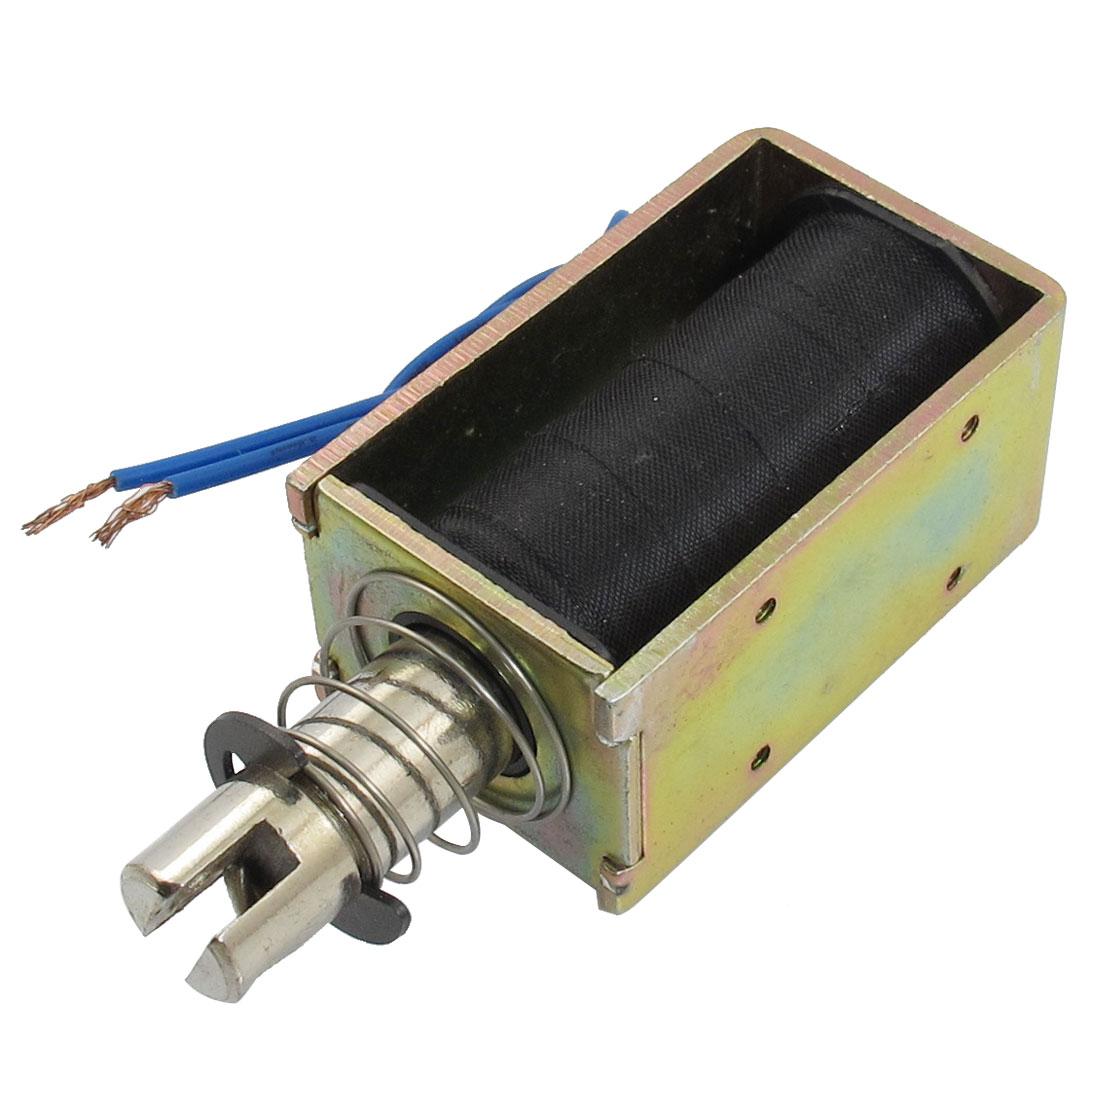 DC 24V 2.5A 10mm Stroke Pull Type Open Frame Solenoid Electromagnet